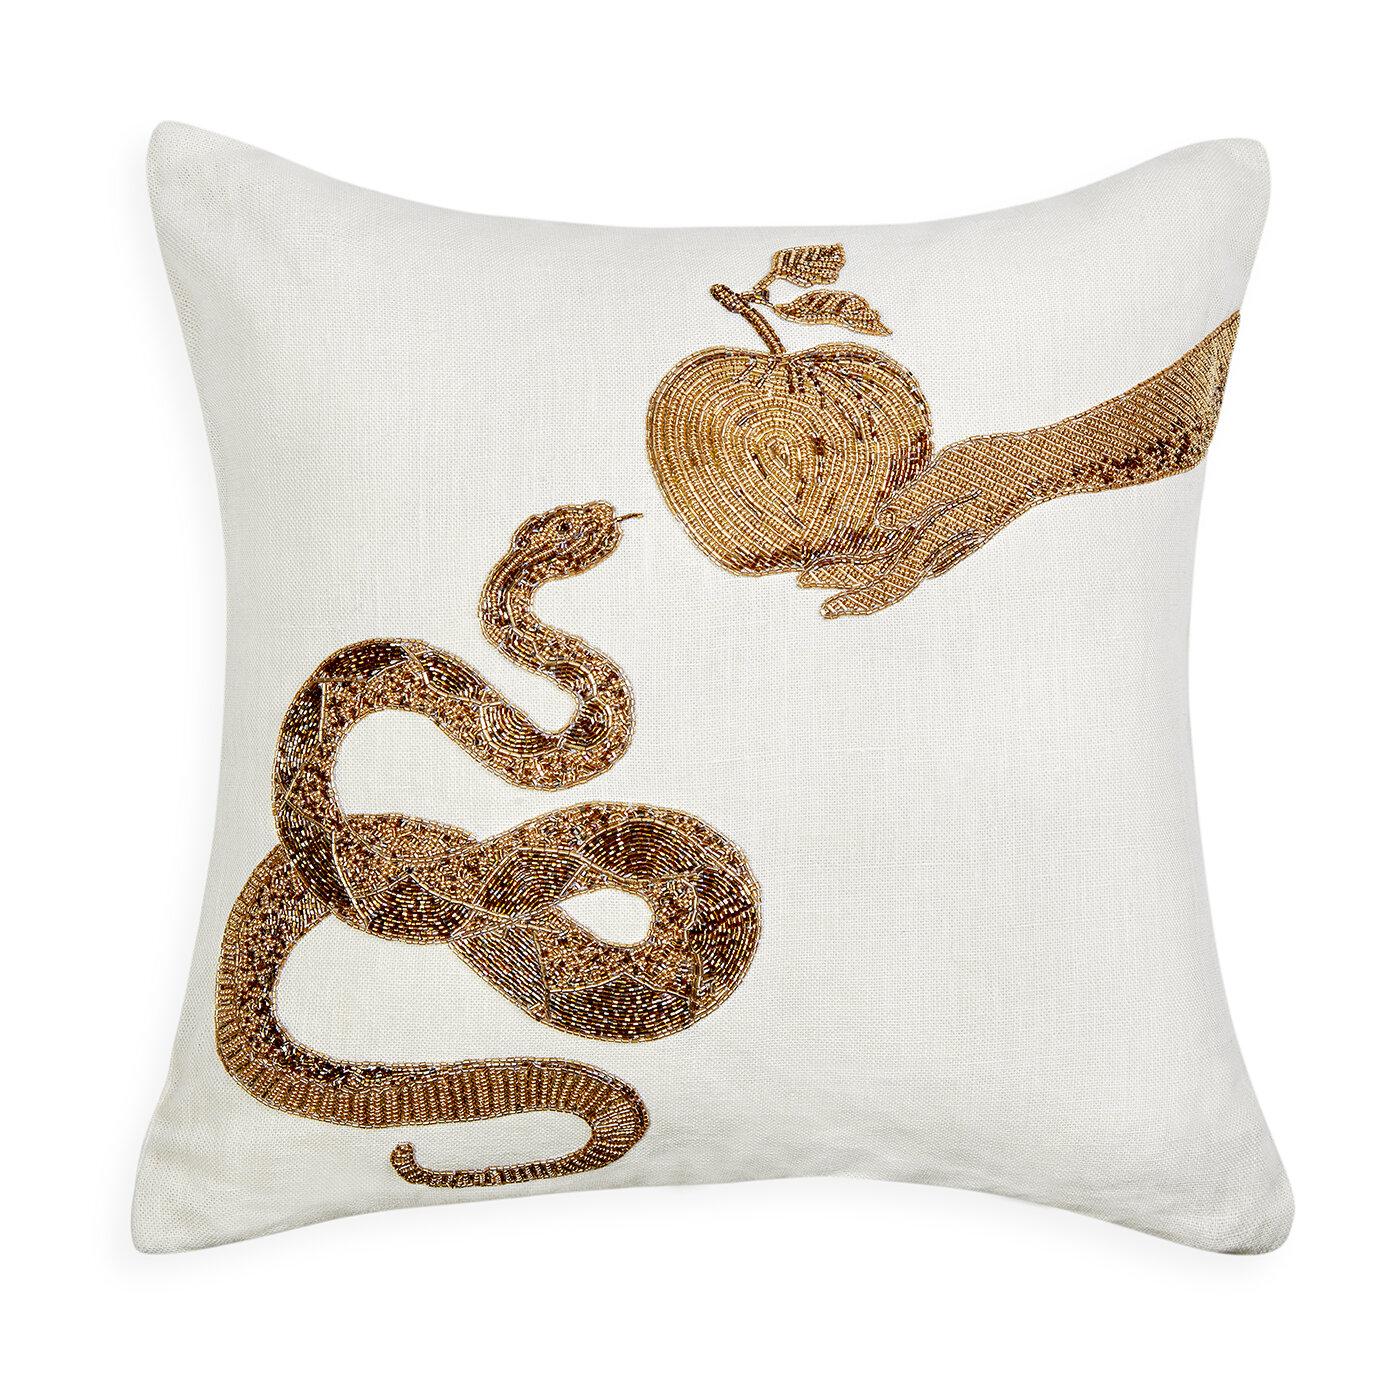 Jonathan Adler Muse Snake And Apple Linen Throw Pillow Wayfair